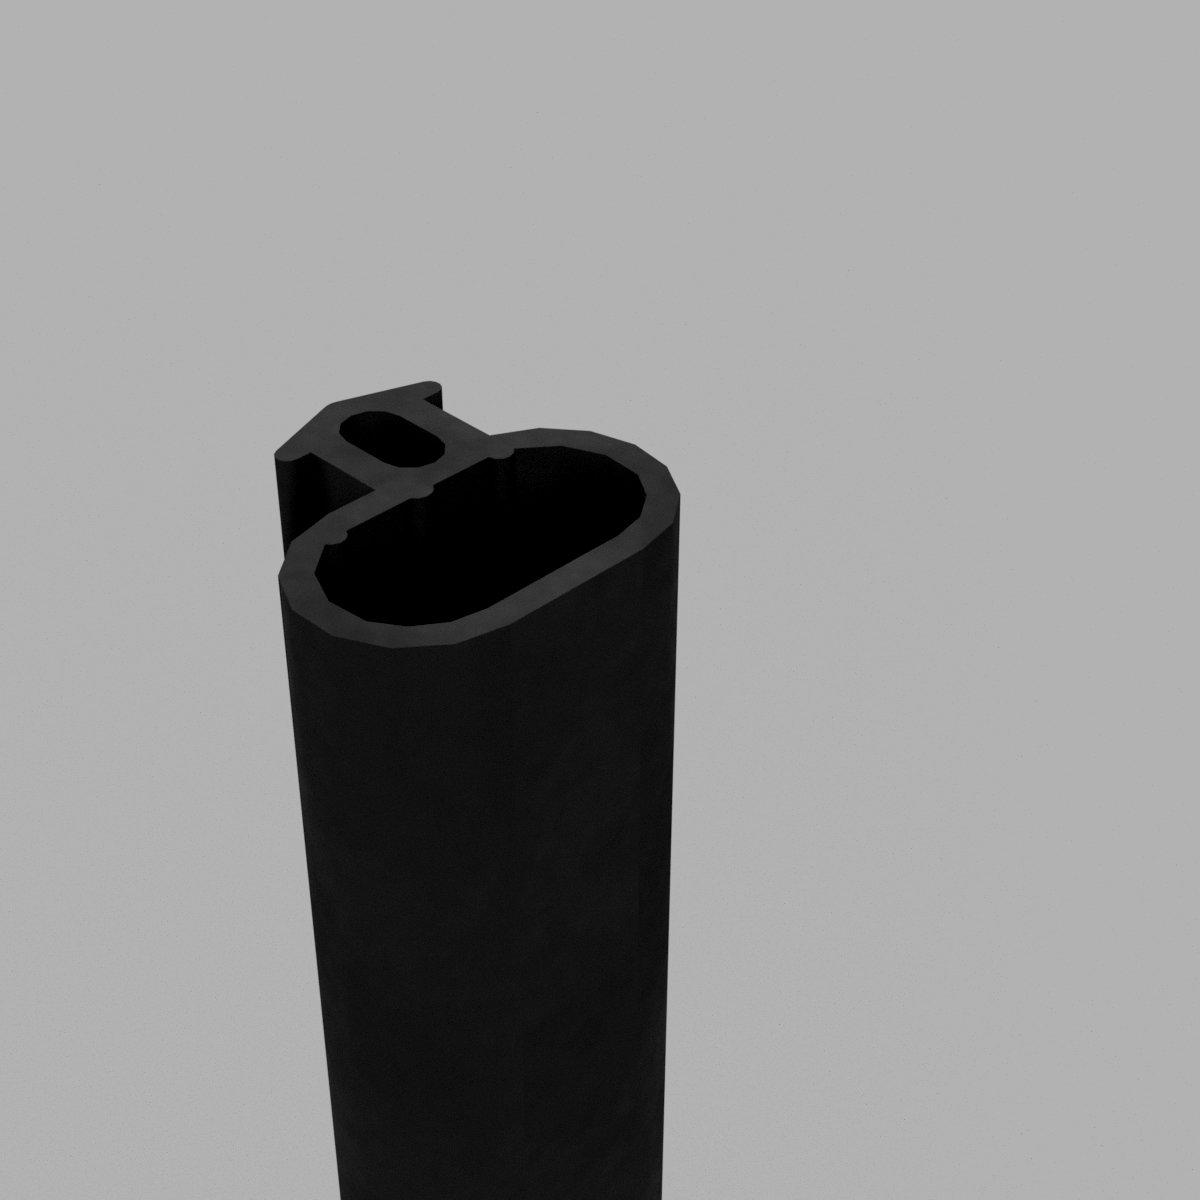 Universal PVCu Seal